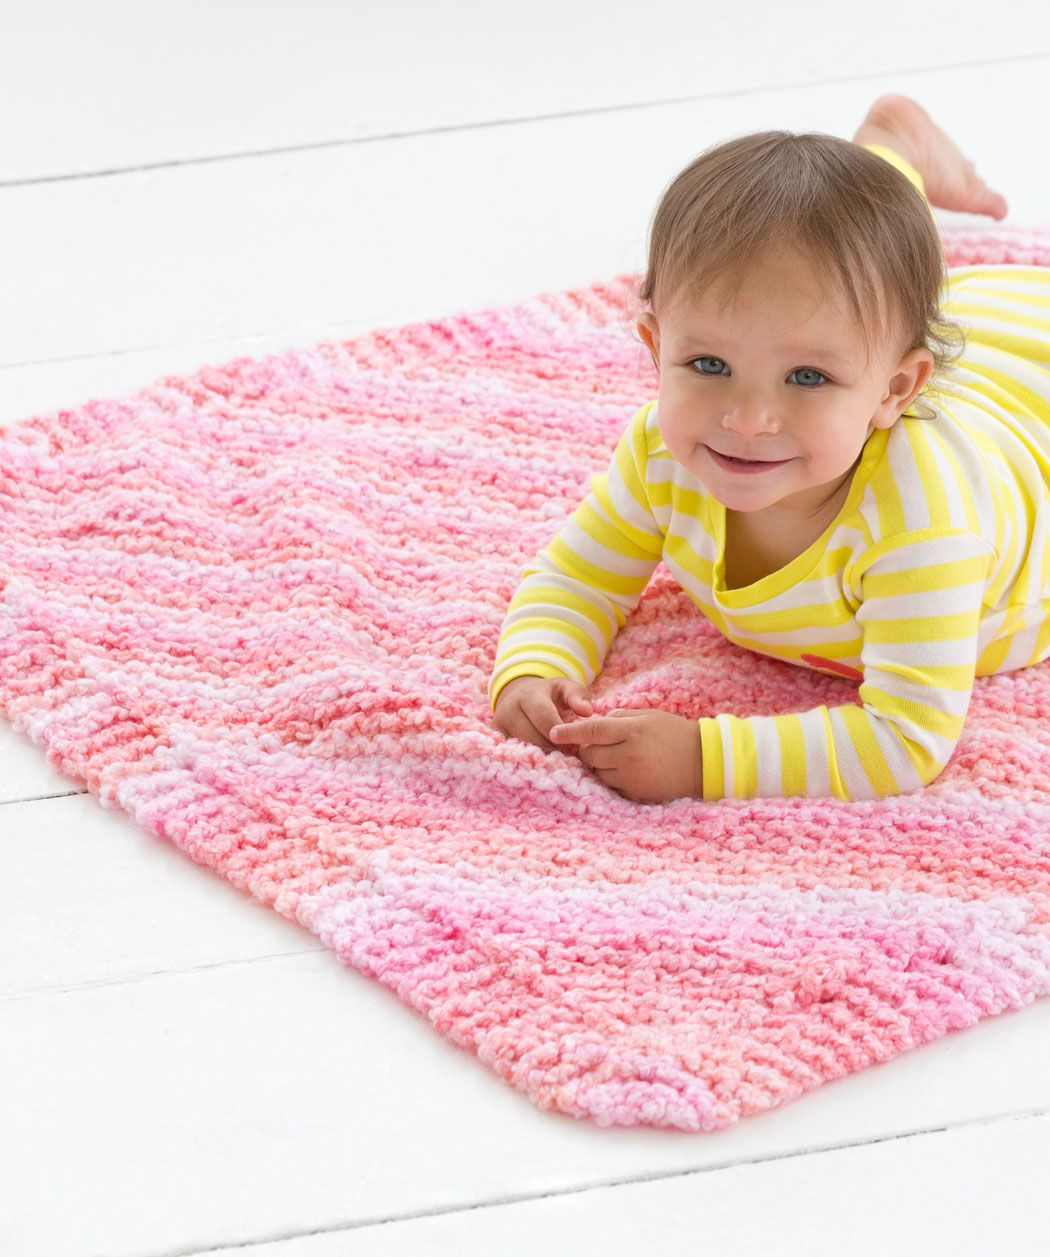 Cuddle bug baby blanket free knitting pattern from red heart yarns cuddle bug baby blanket free knitting pattern from red heart yarns bankloansurffo Gallery